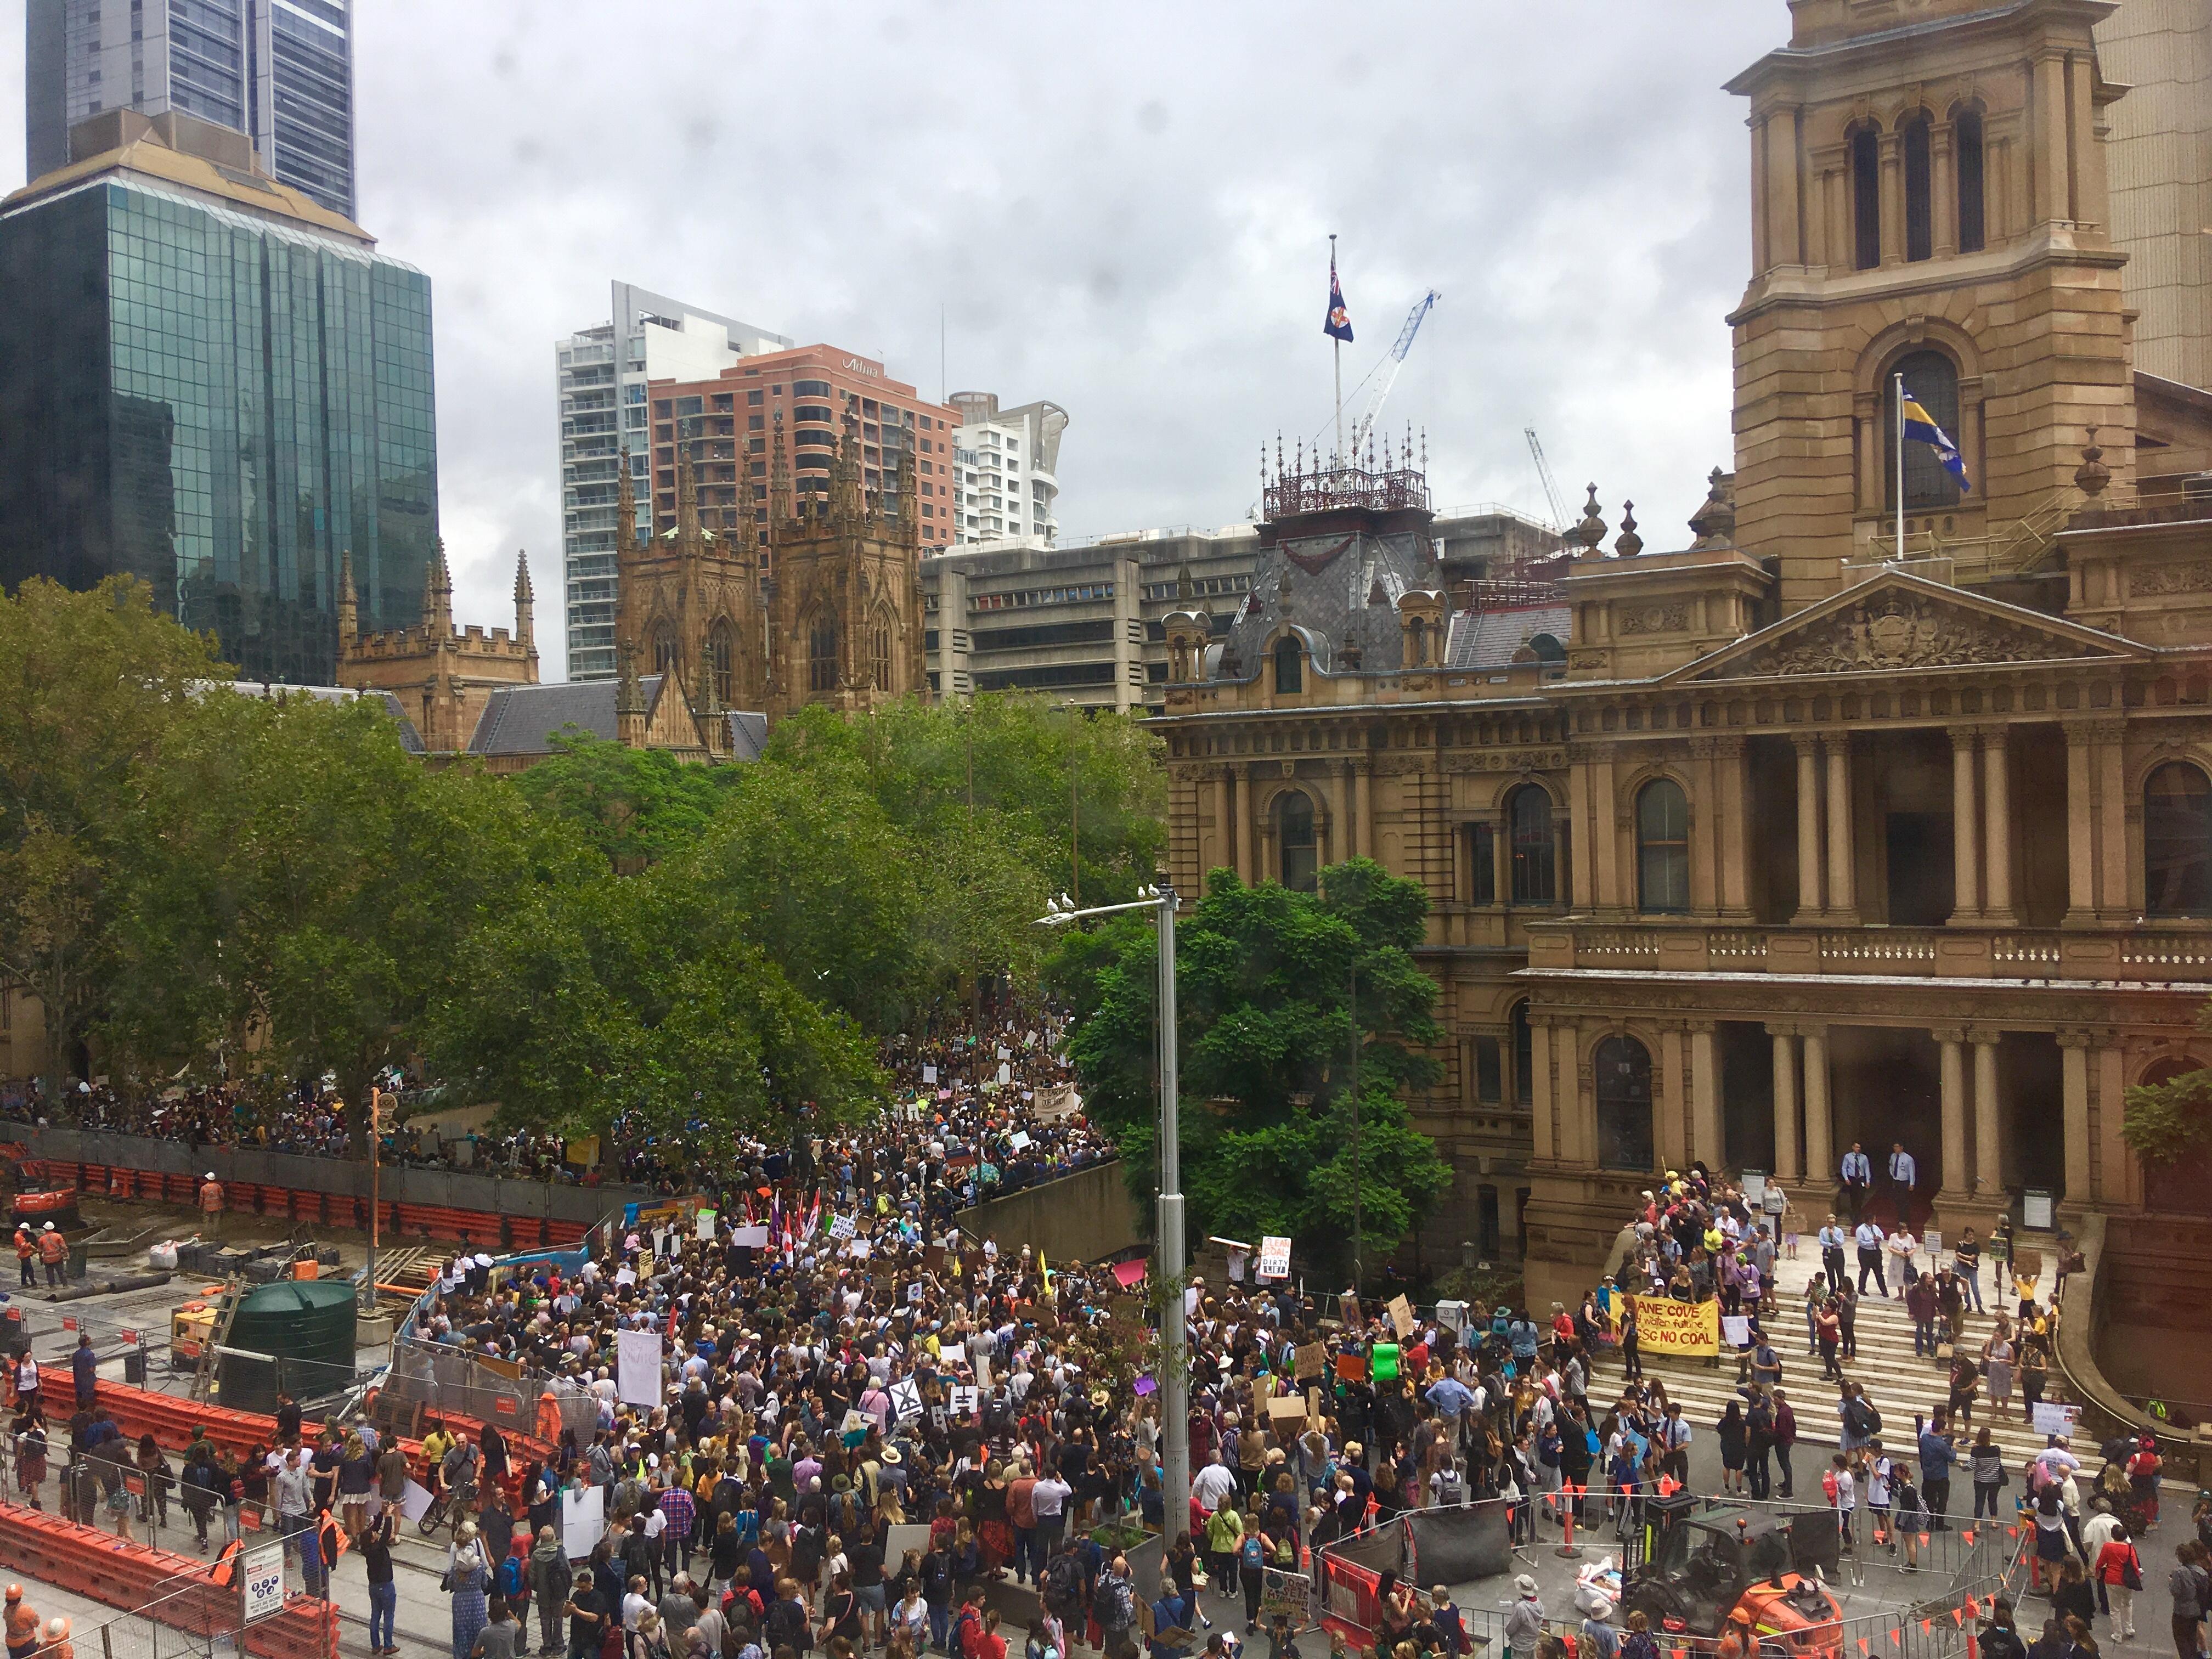 School strike for climate change, Sydney, March 2019